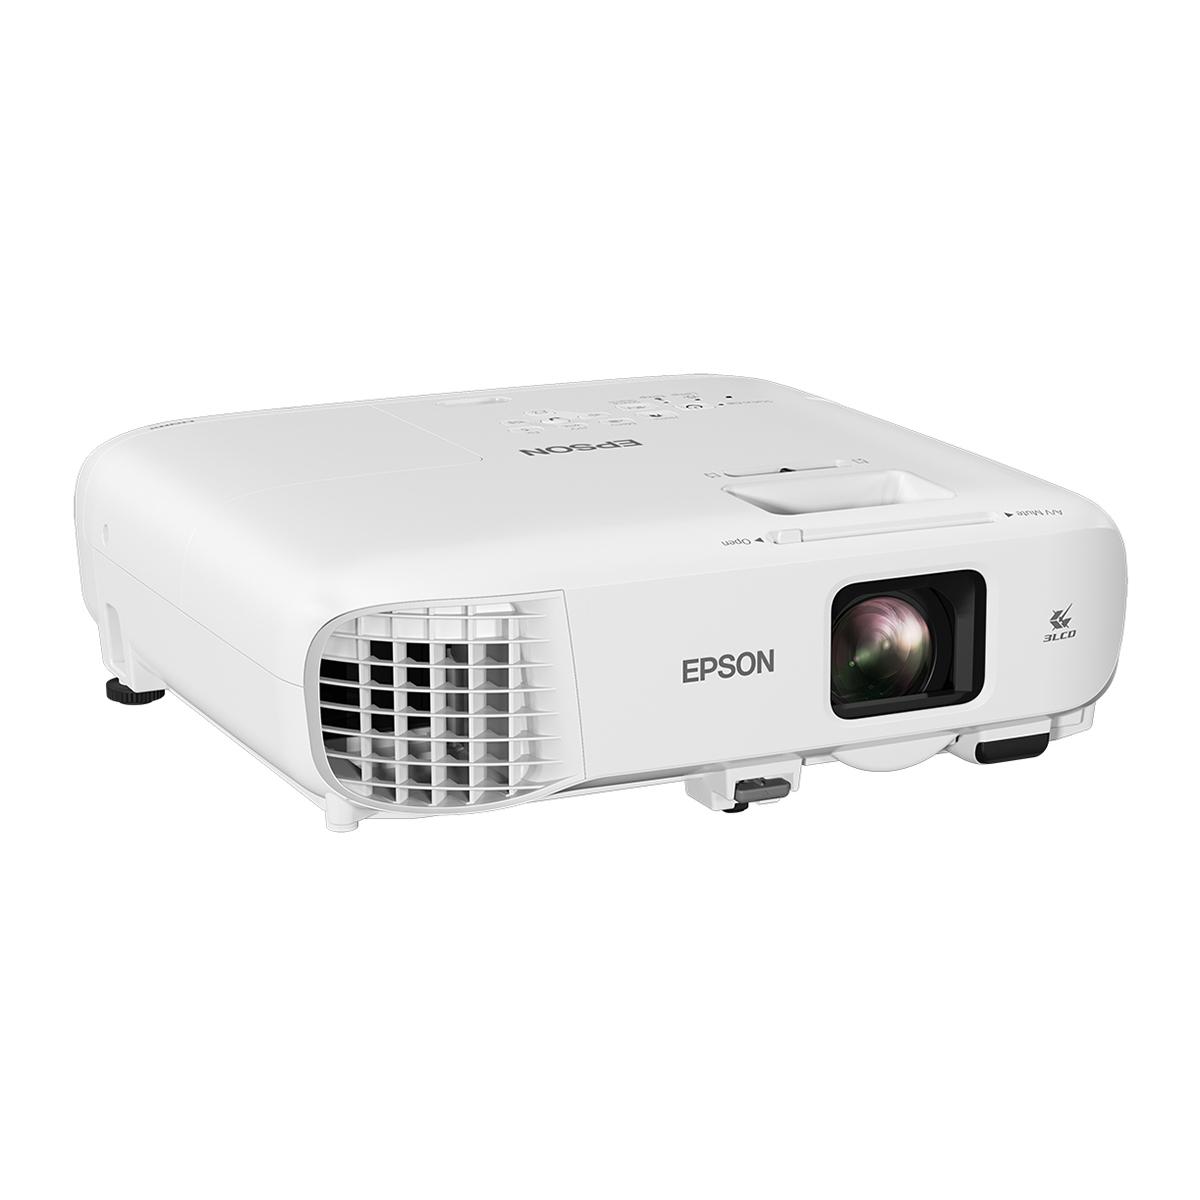 Epson EB-2042 XGA Portable Projector